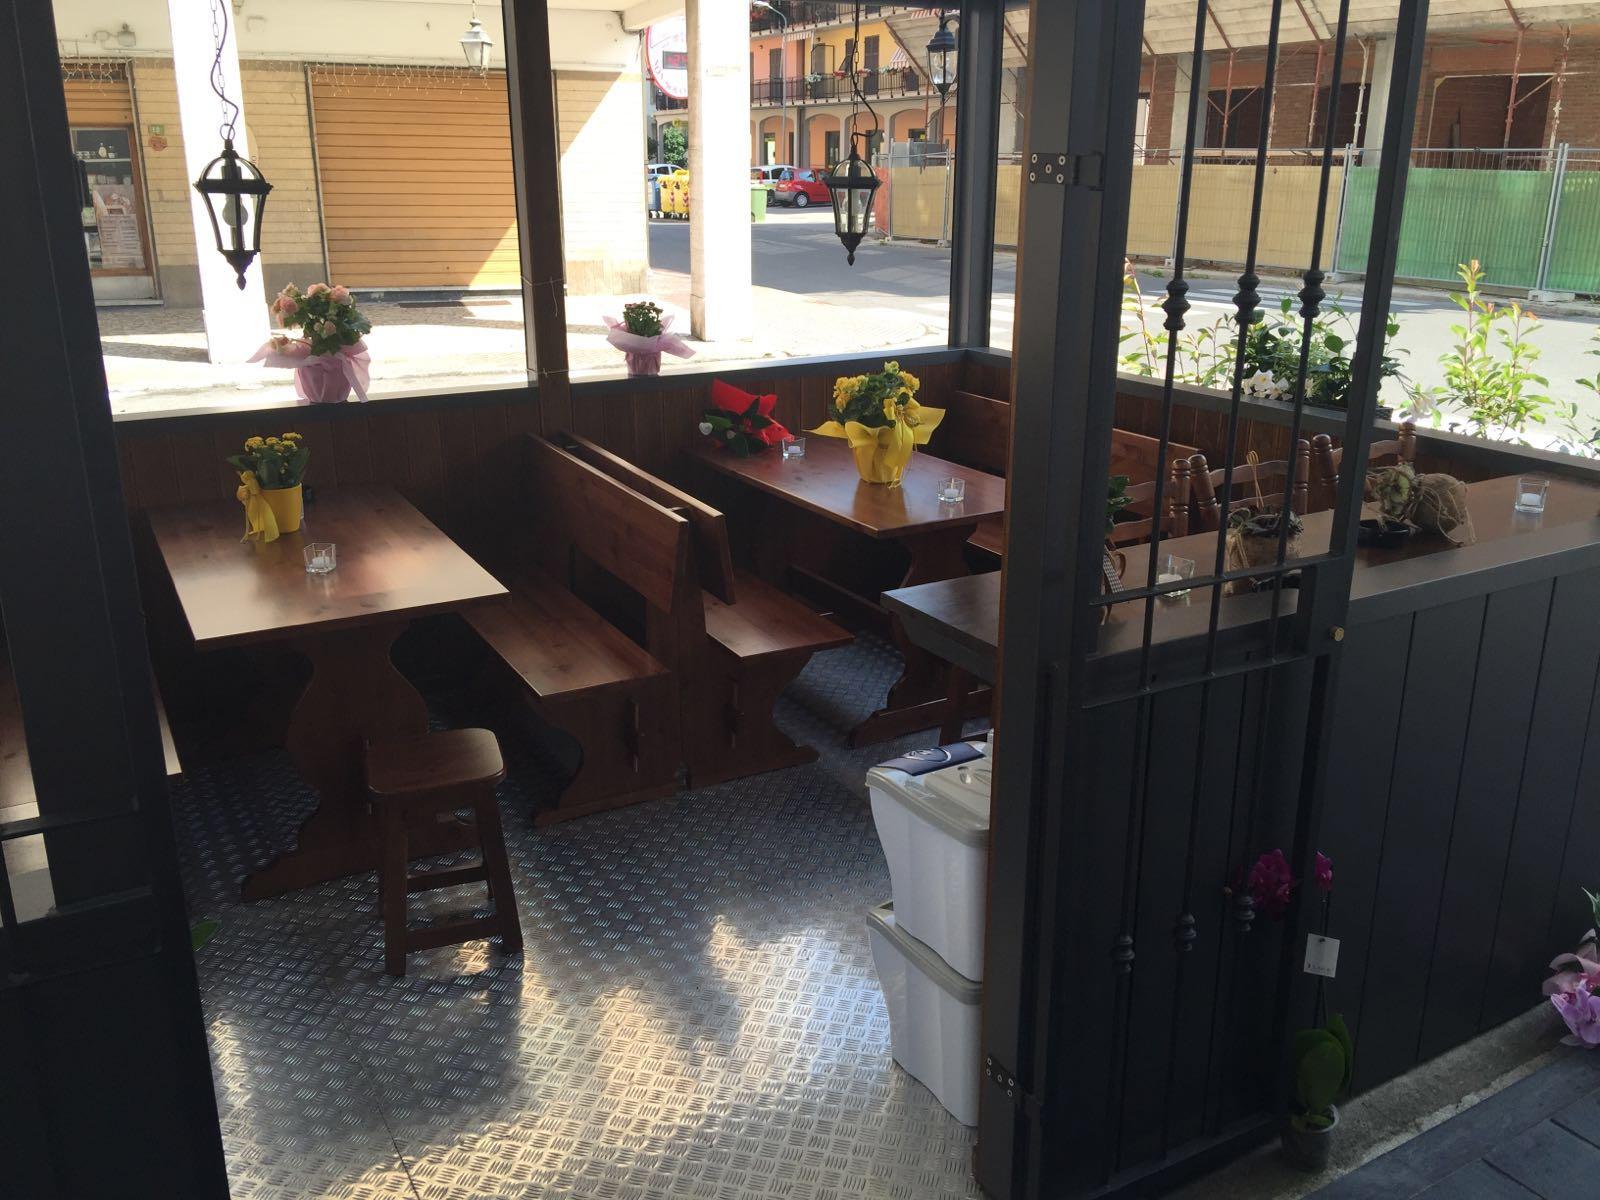 Panche Legno Per Pub.Panchina Per Bar Panchina Per Bar Sgabelli Da Cucina E Bar